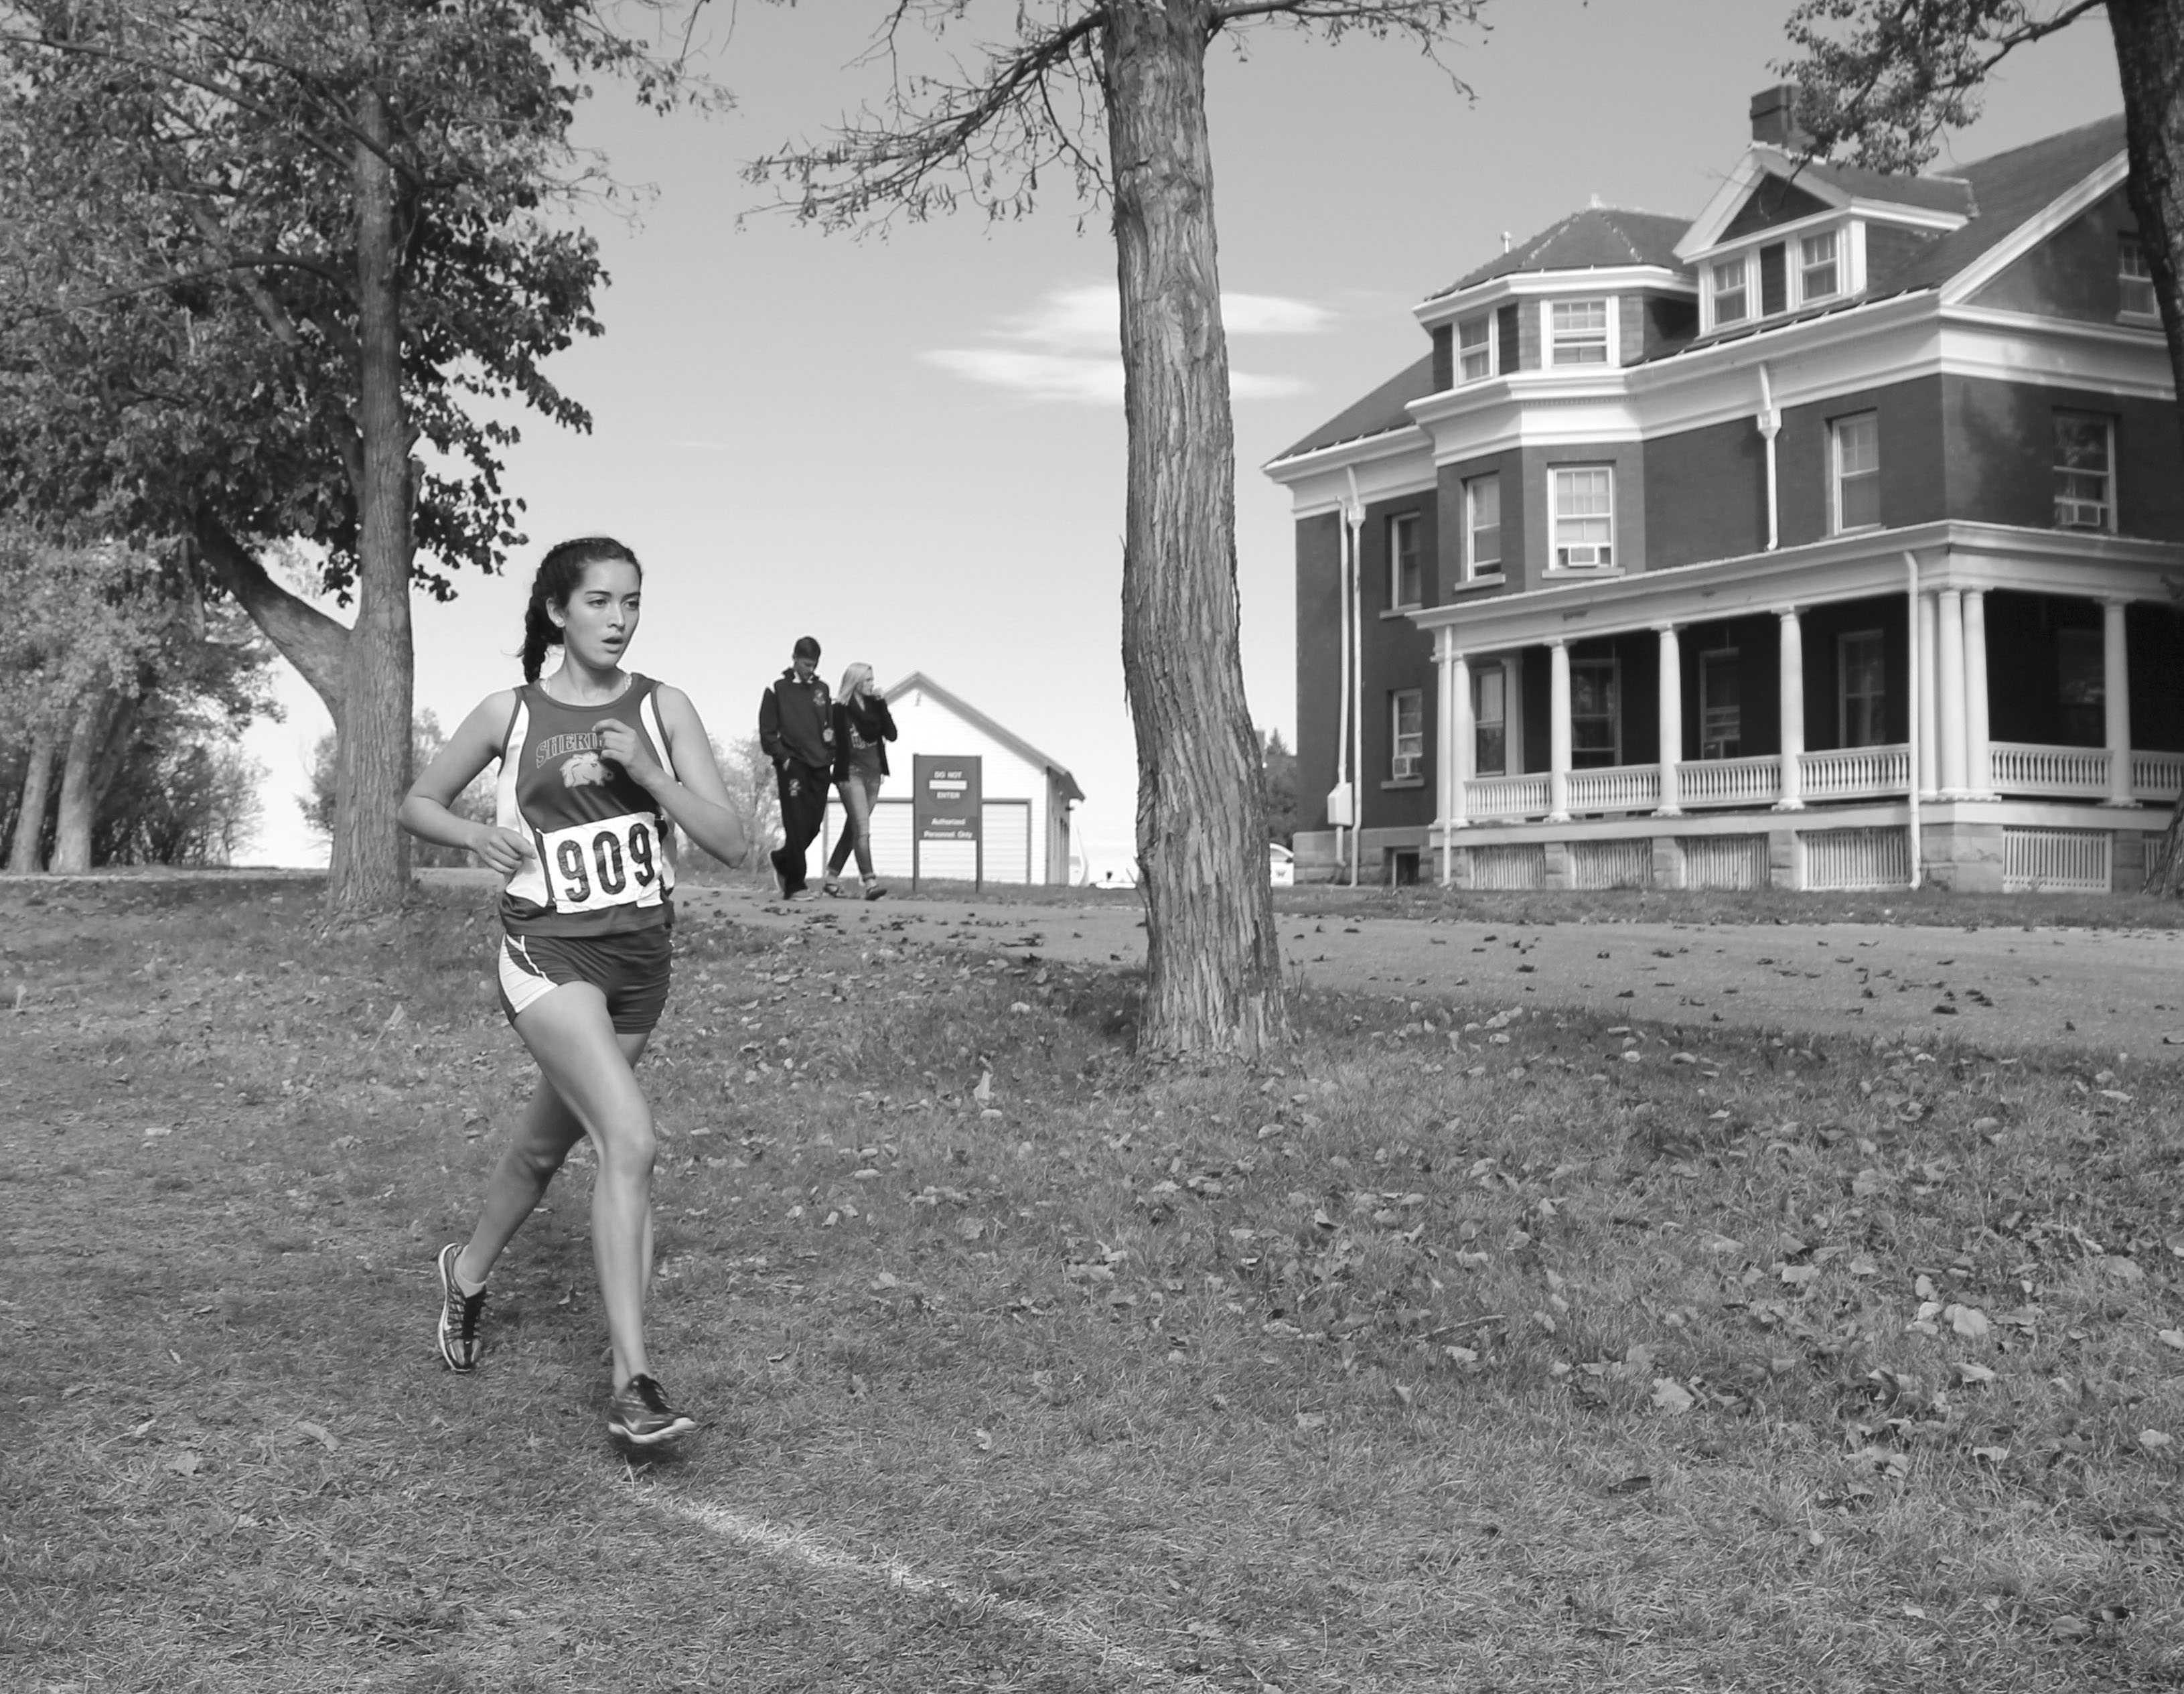 Senior girls varsity runner Xiomara Robinson races through the last quarter mile of her 5K at the Sheridan VA Medical Center state cross country meet on Saturday, Oct. 22, 2016.